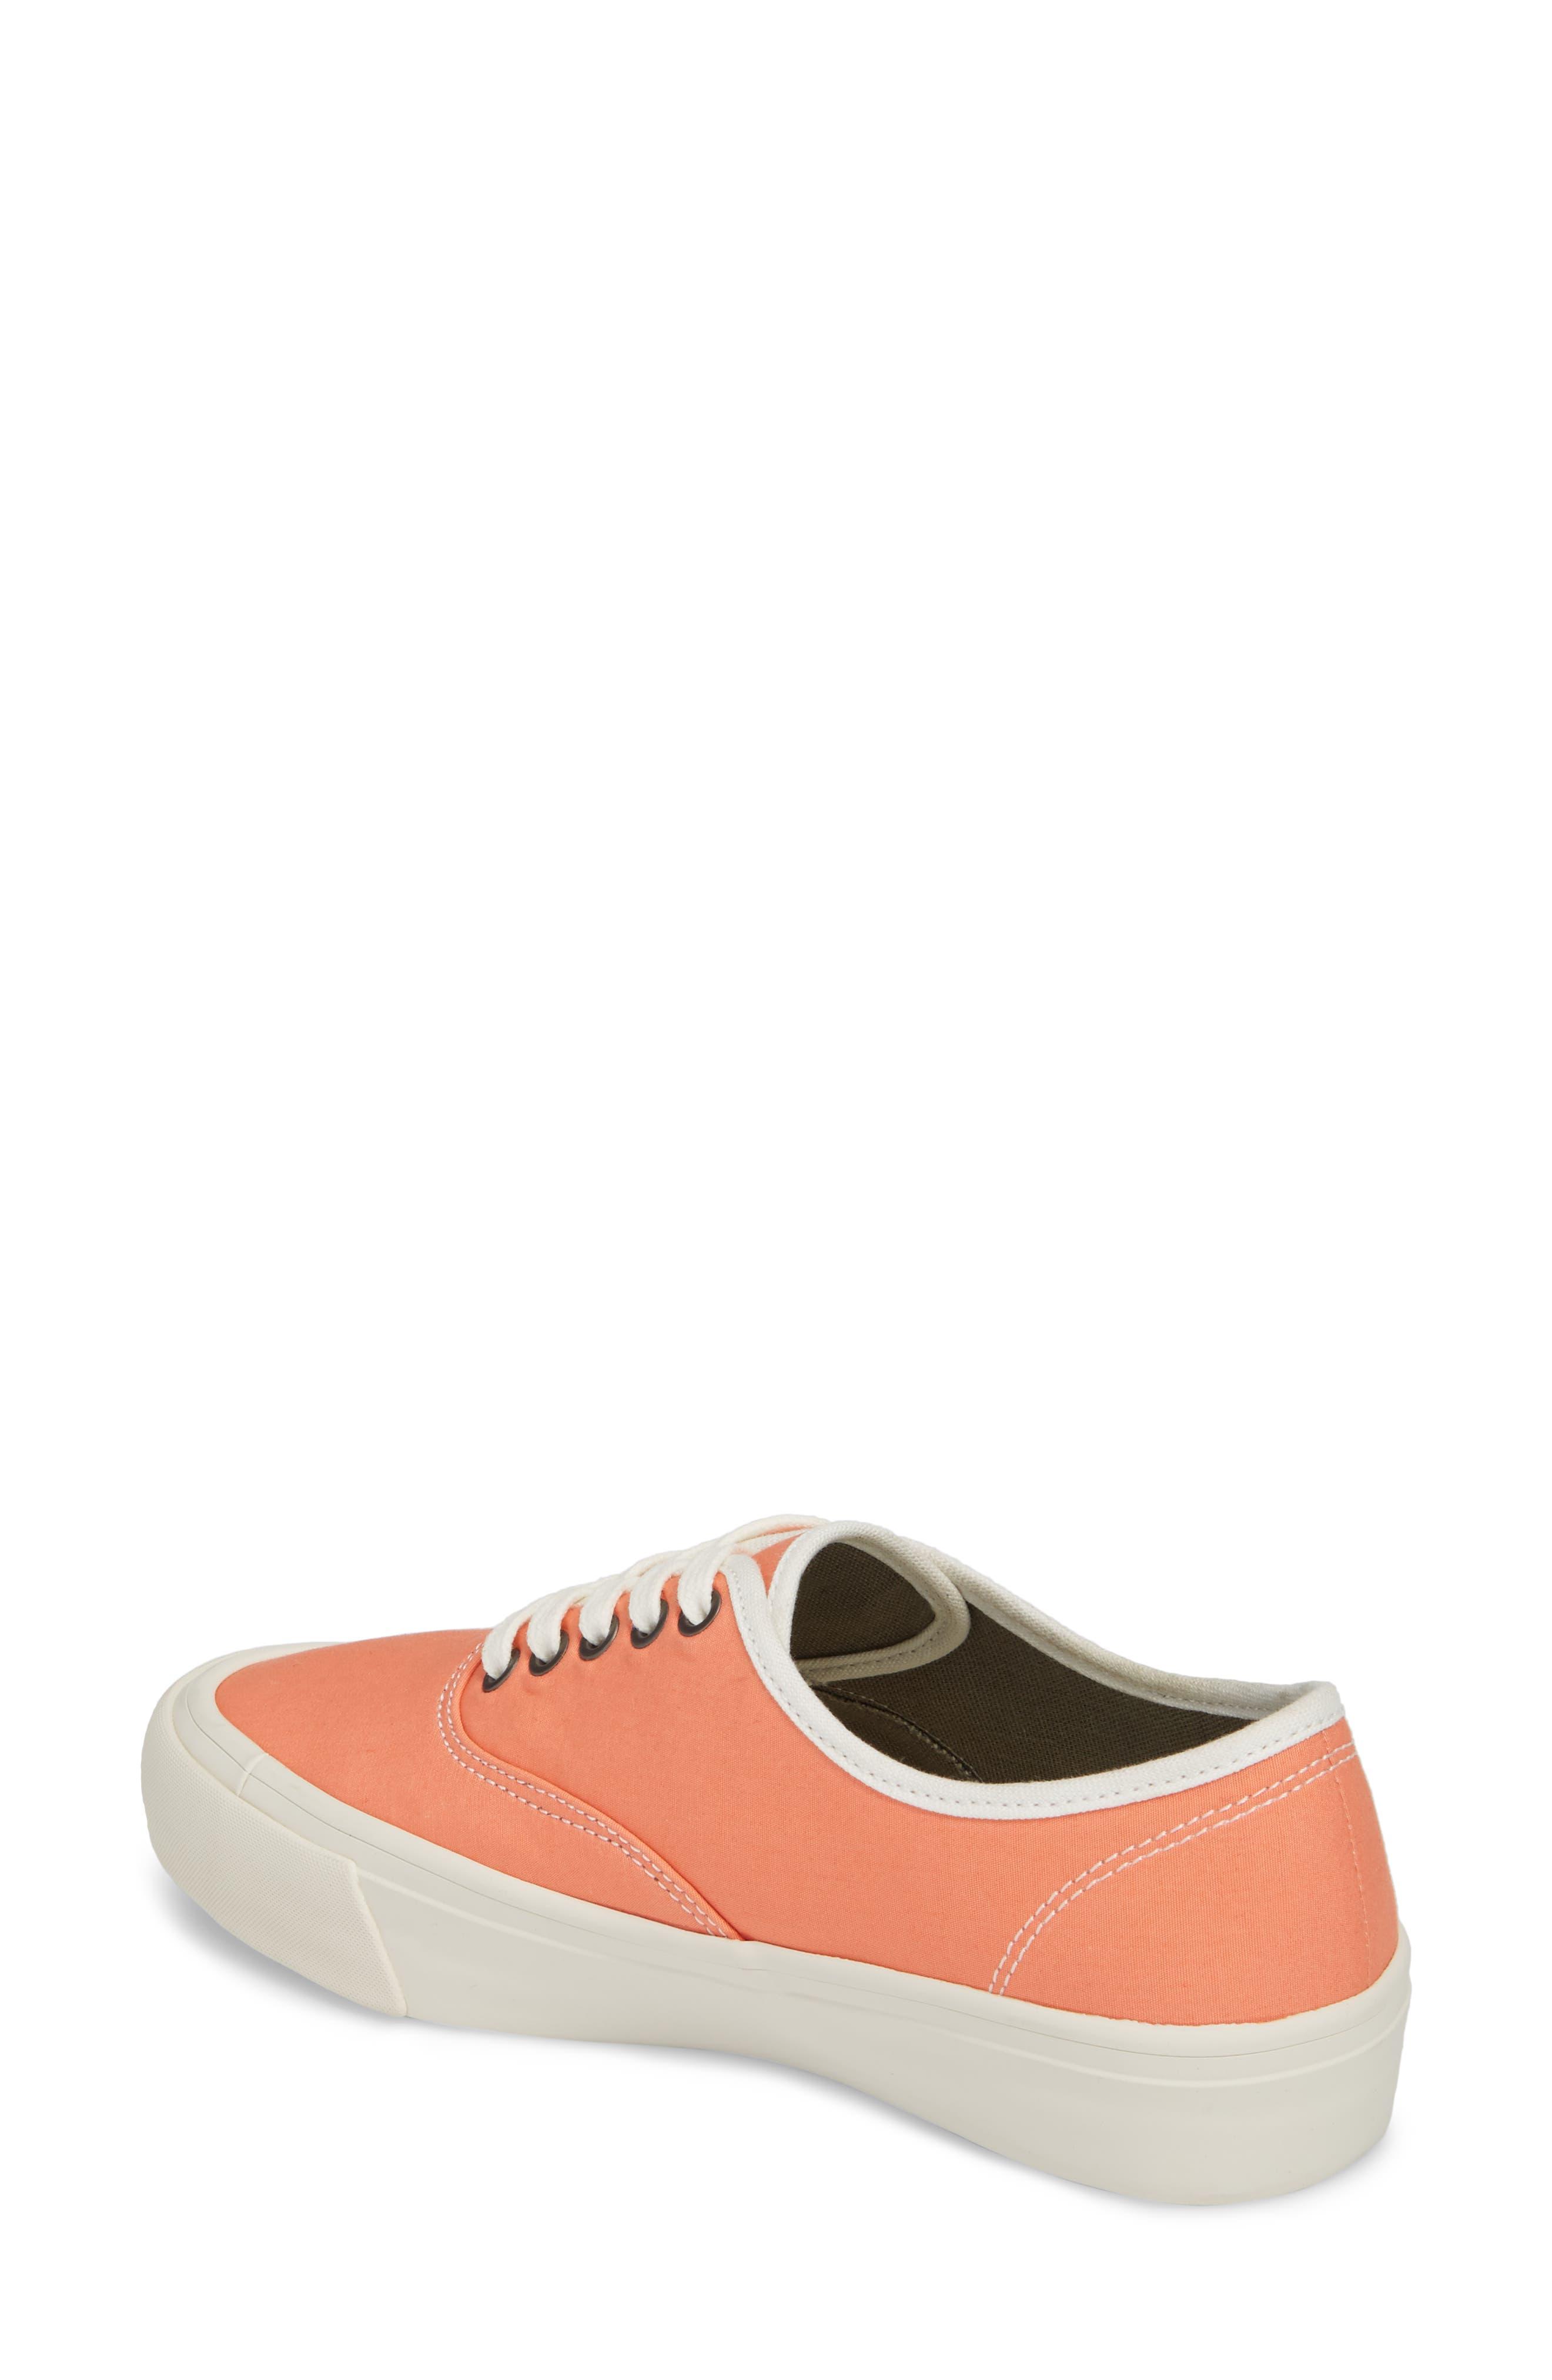 Legend Standard Sneaker,                             Alternate thumbnail 2, color,                             Coral